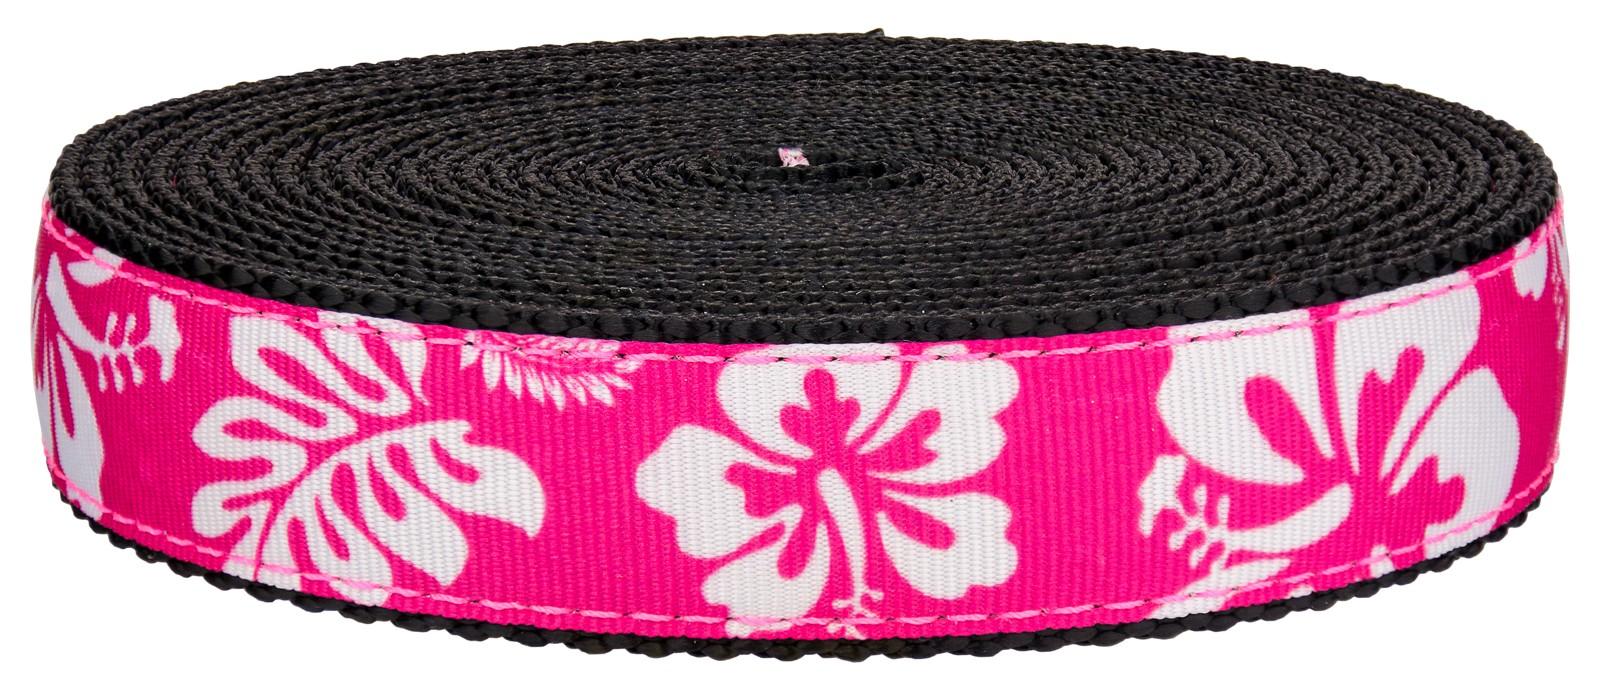 Buy 1 Inch Pink Hawaiian On Black Nylon Webbing Online